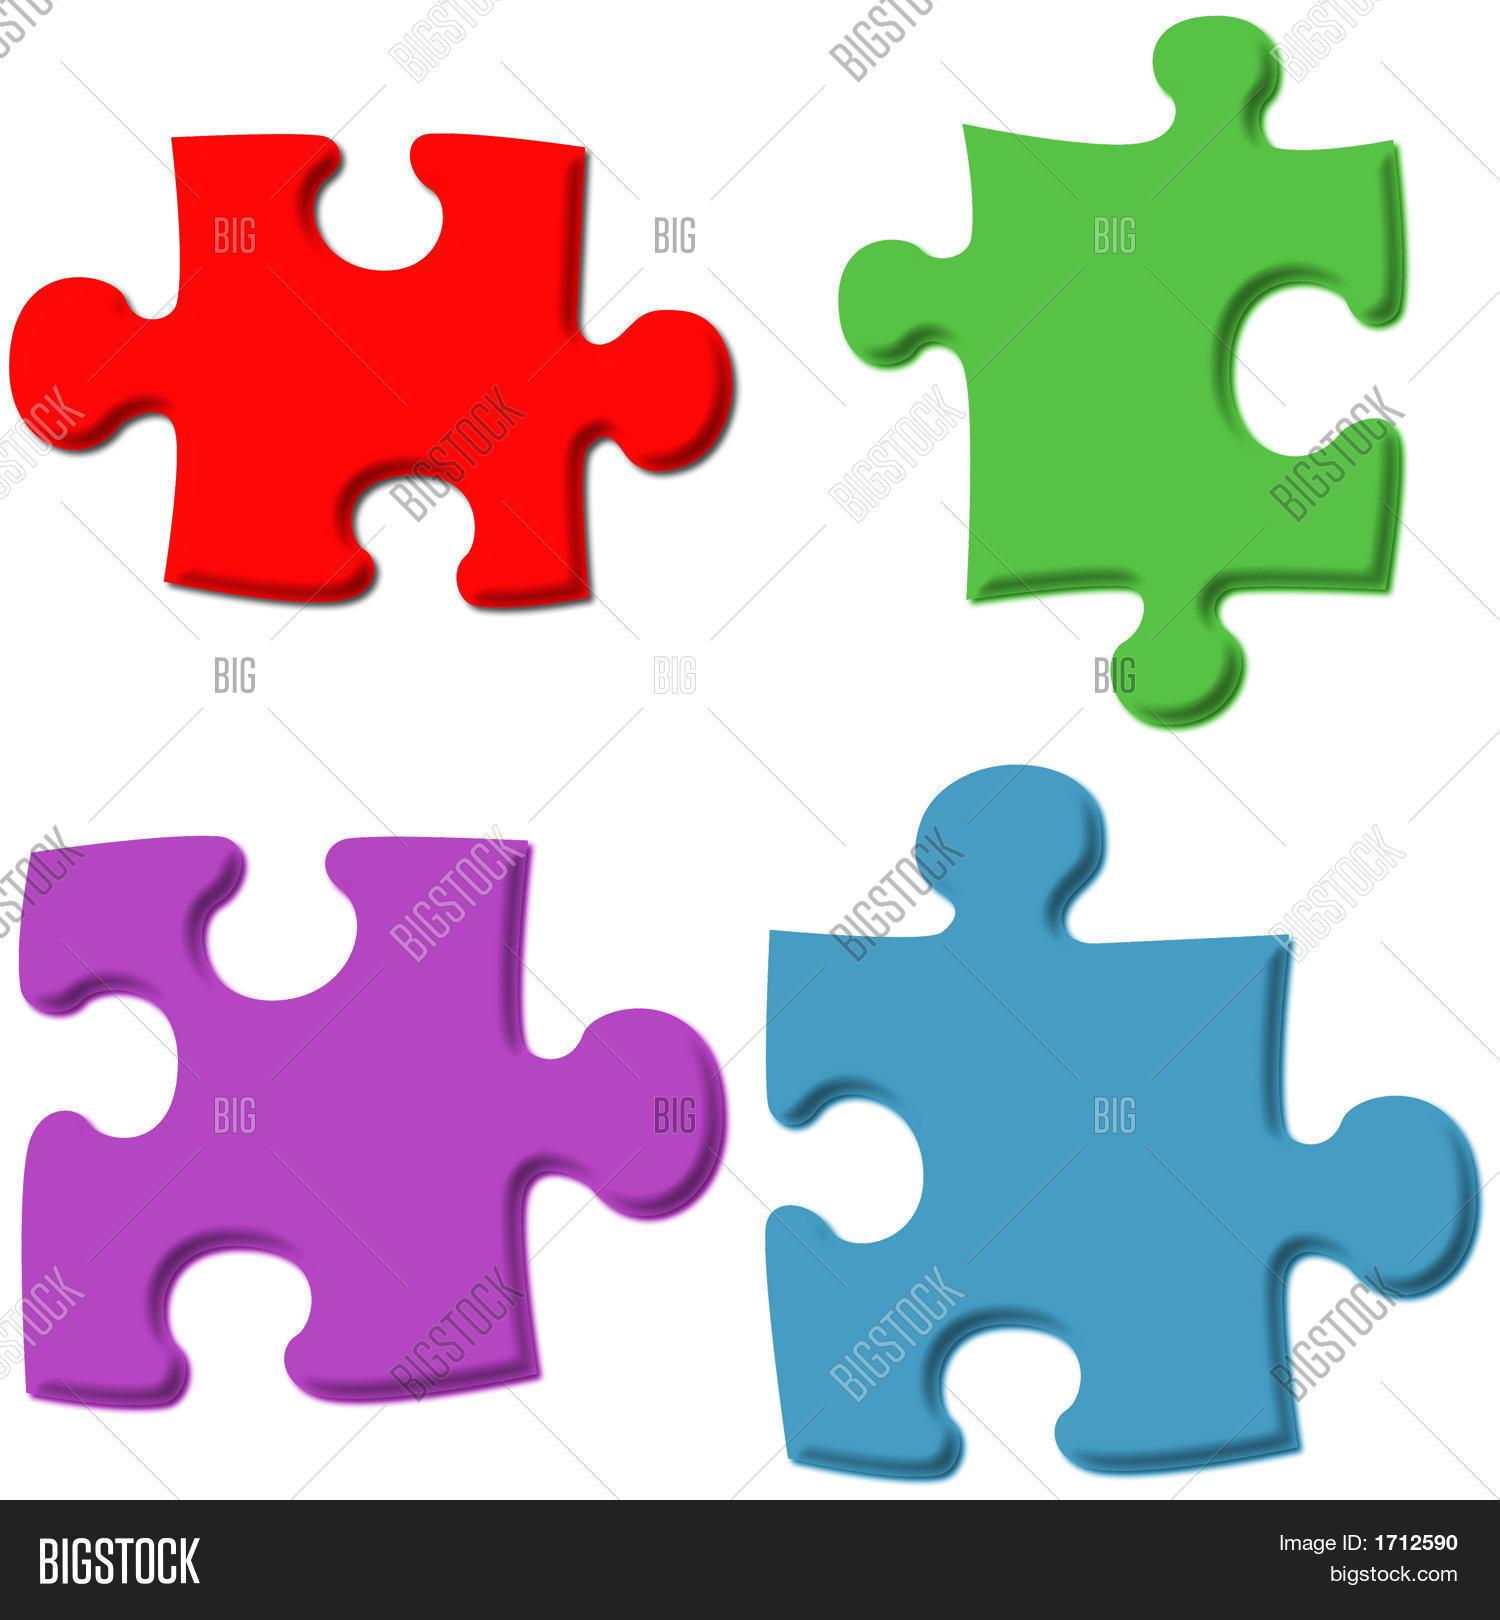 3D Puzzle Pieces Image & Photo (Free Trial) | Bigstock